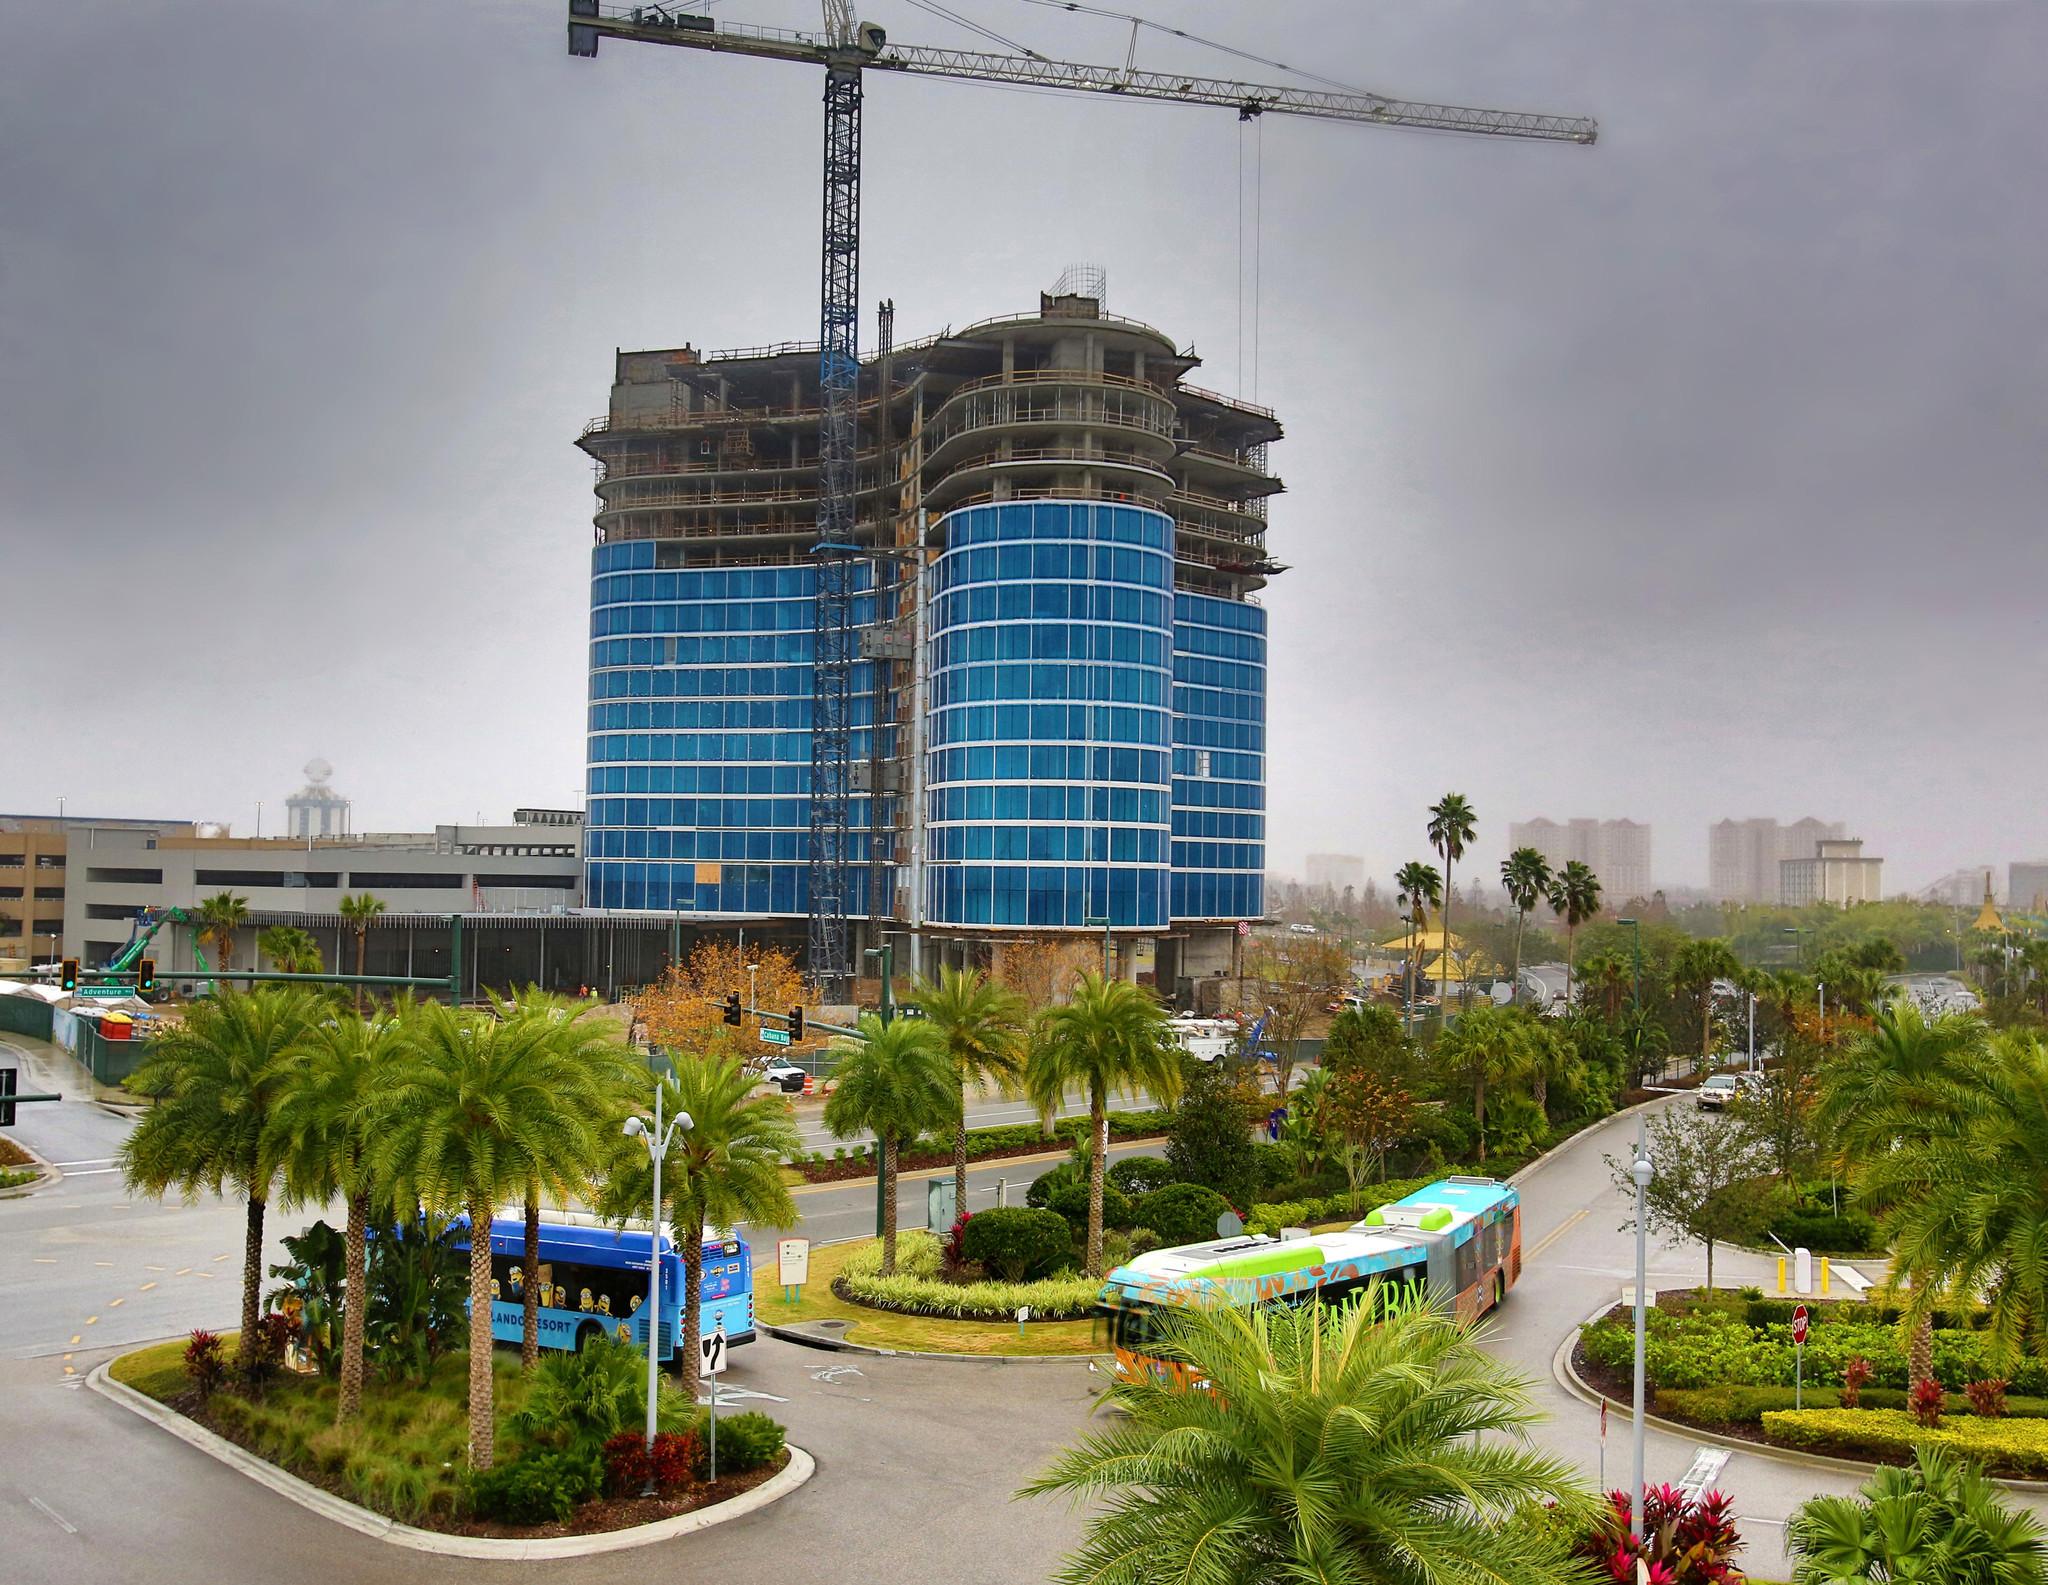 The Contemporary Hotel Florida